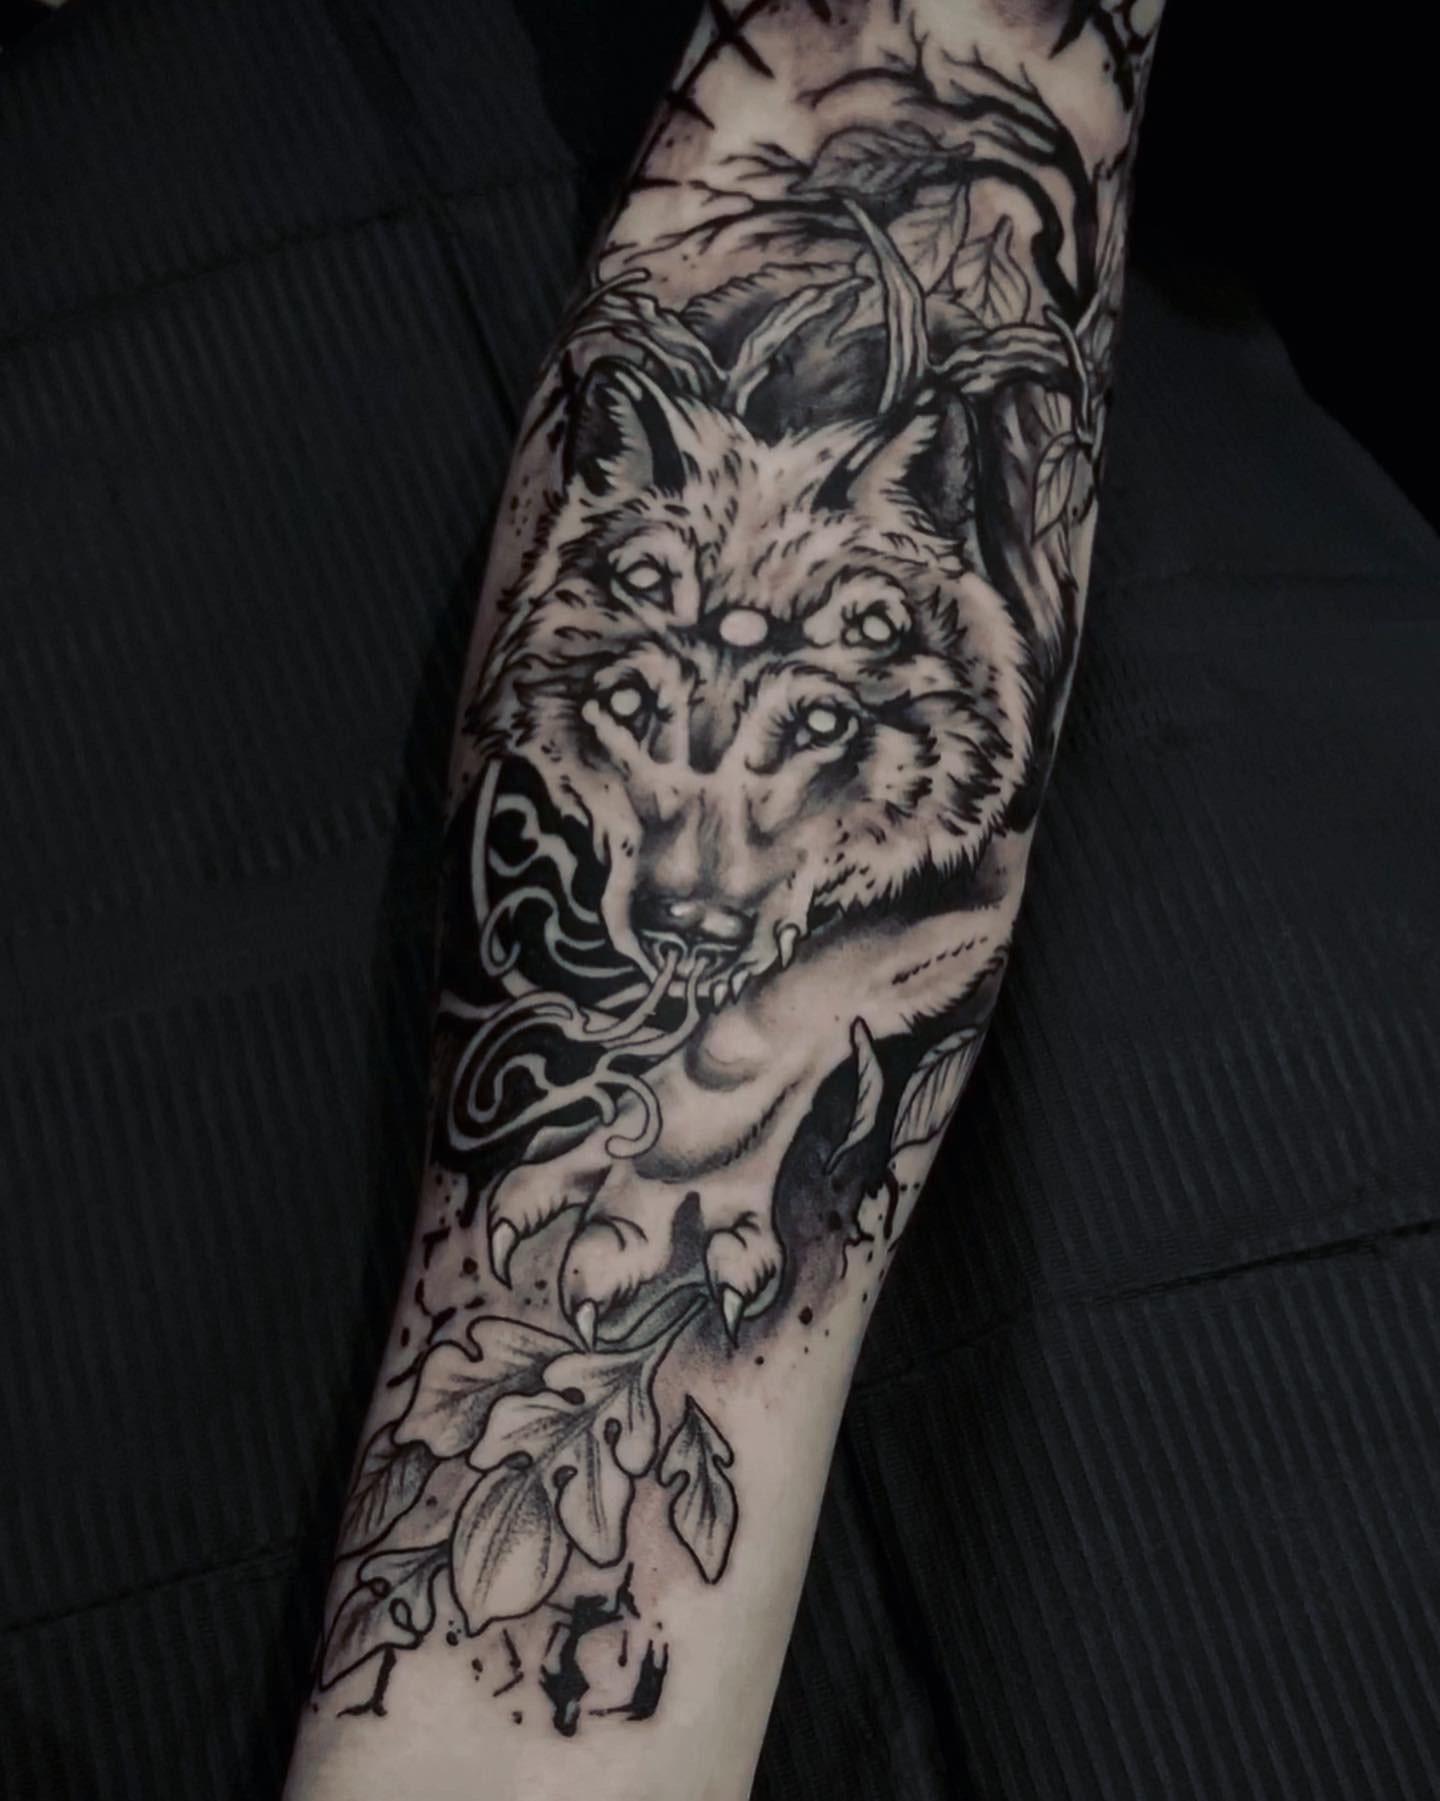 Tattoo Anansi München Artist David blackwork wolf demon Dämon